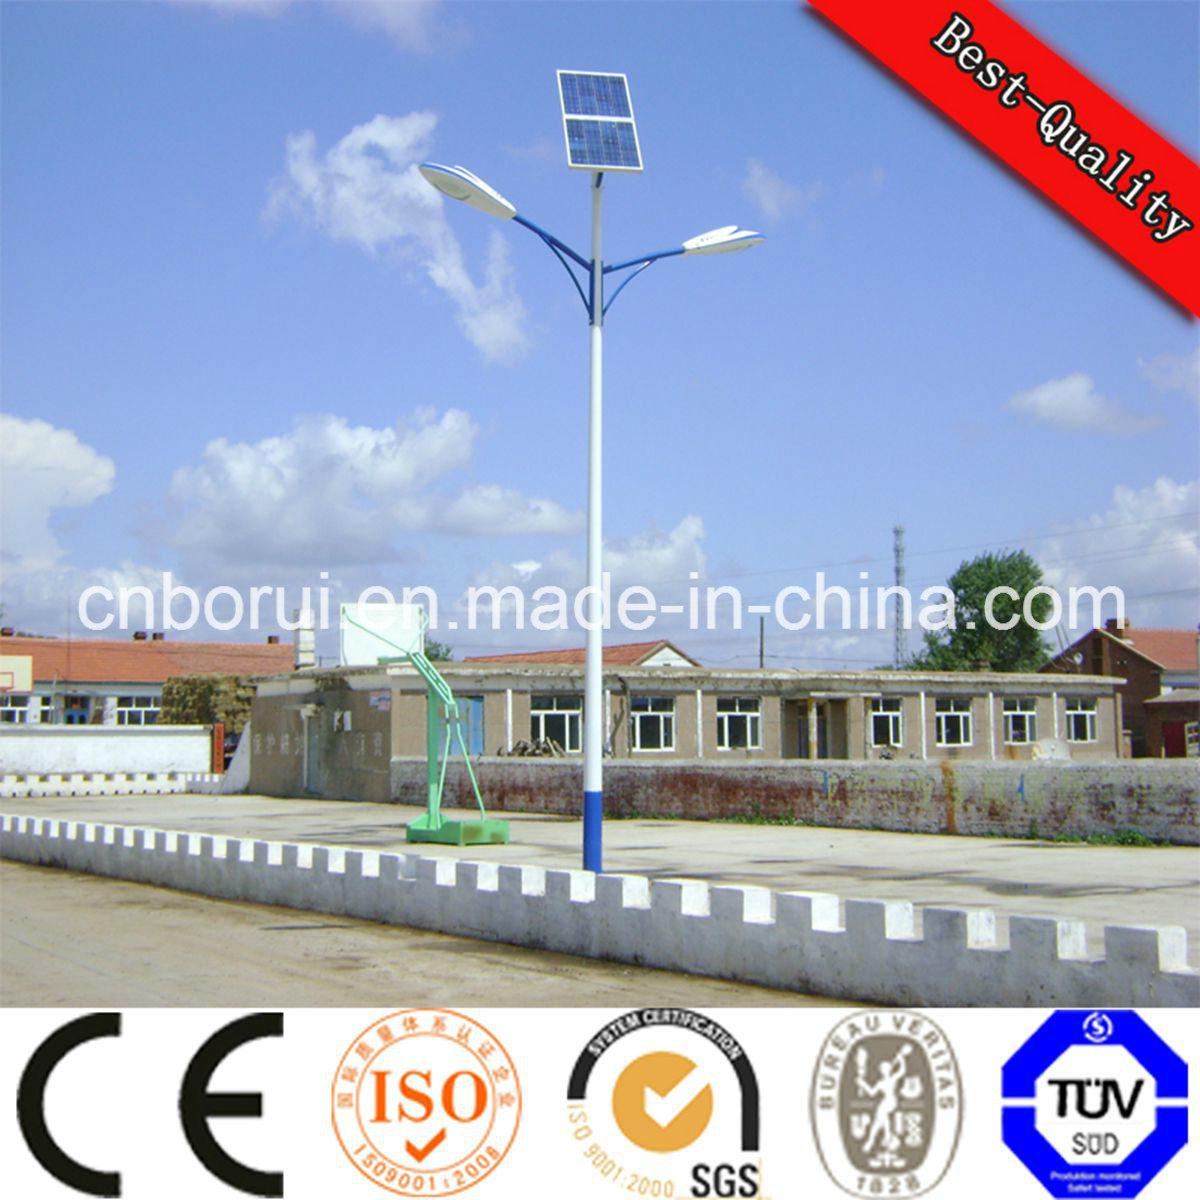 30W Energy Saving Lamp IP65 Solar panel Street LED Light, Energy Saving Bulbs Manufacturers in China